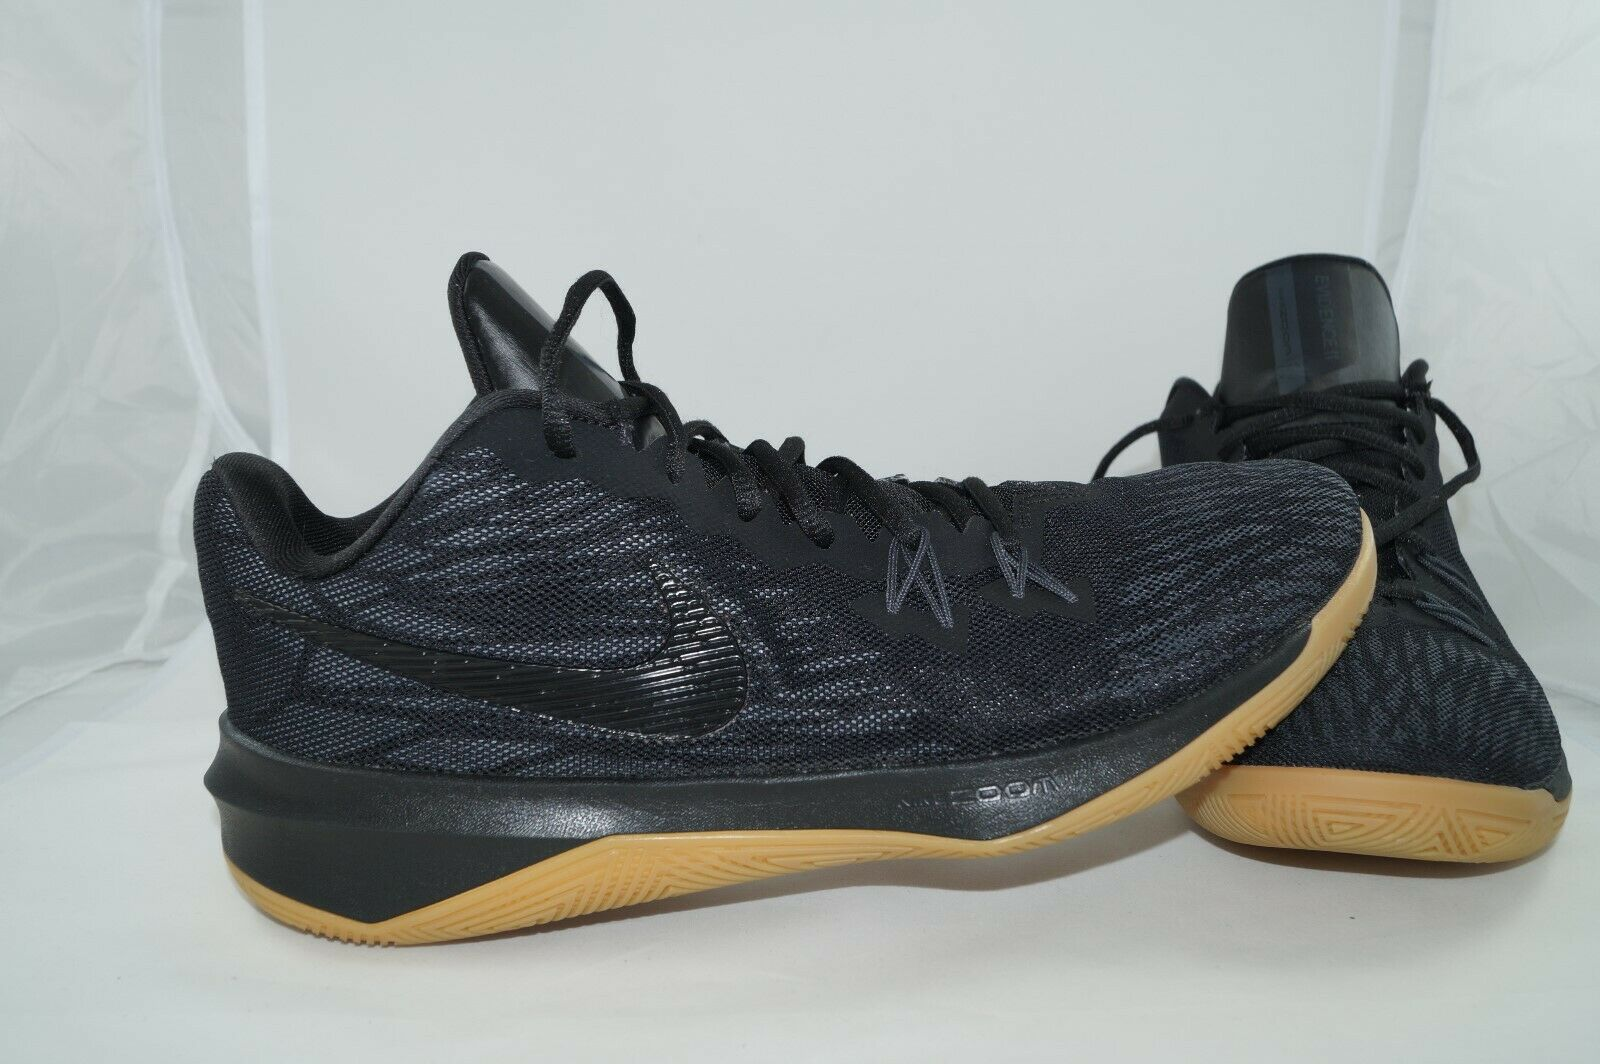 Nike Zoom Evidence II EU 45 US 11 UK 10 Sportschuhe 908976-012 Schwarz